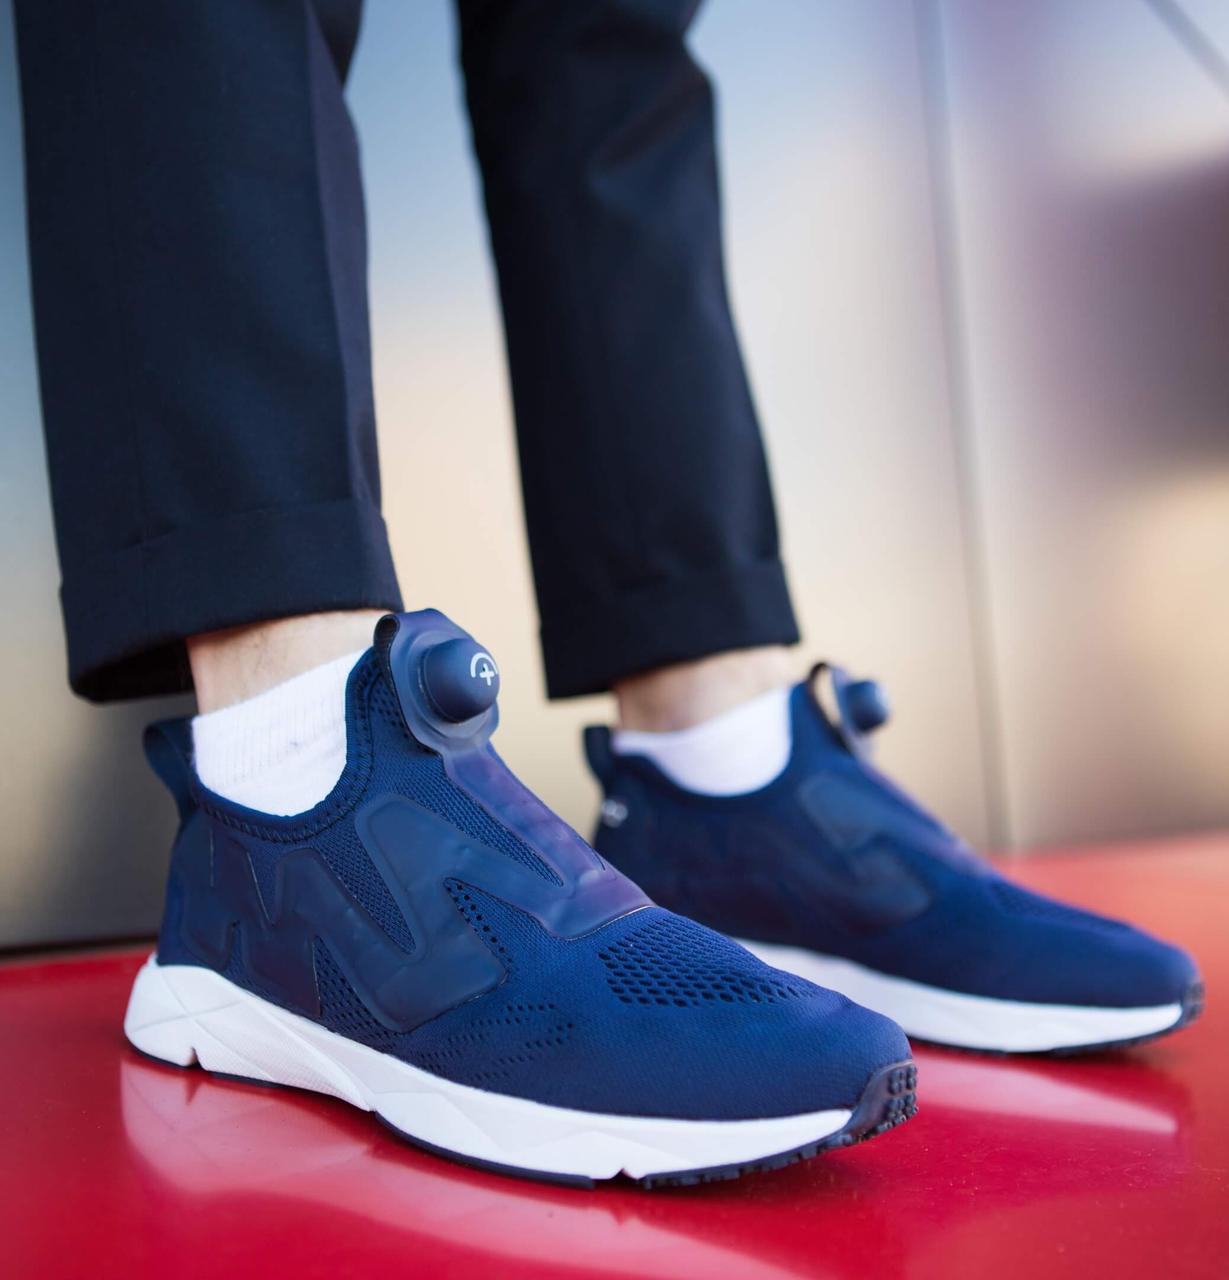 Мужские кроссовки Ветементс (синие)